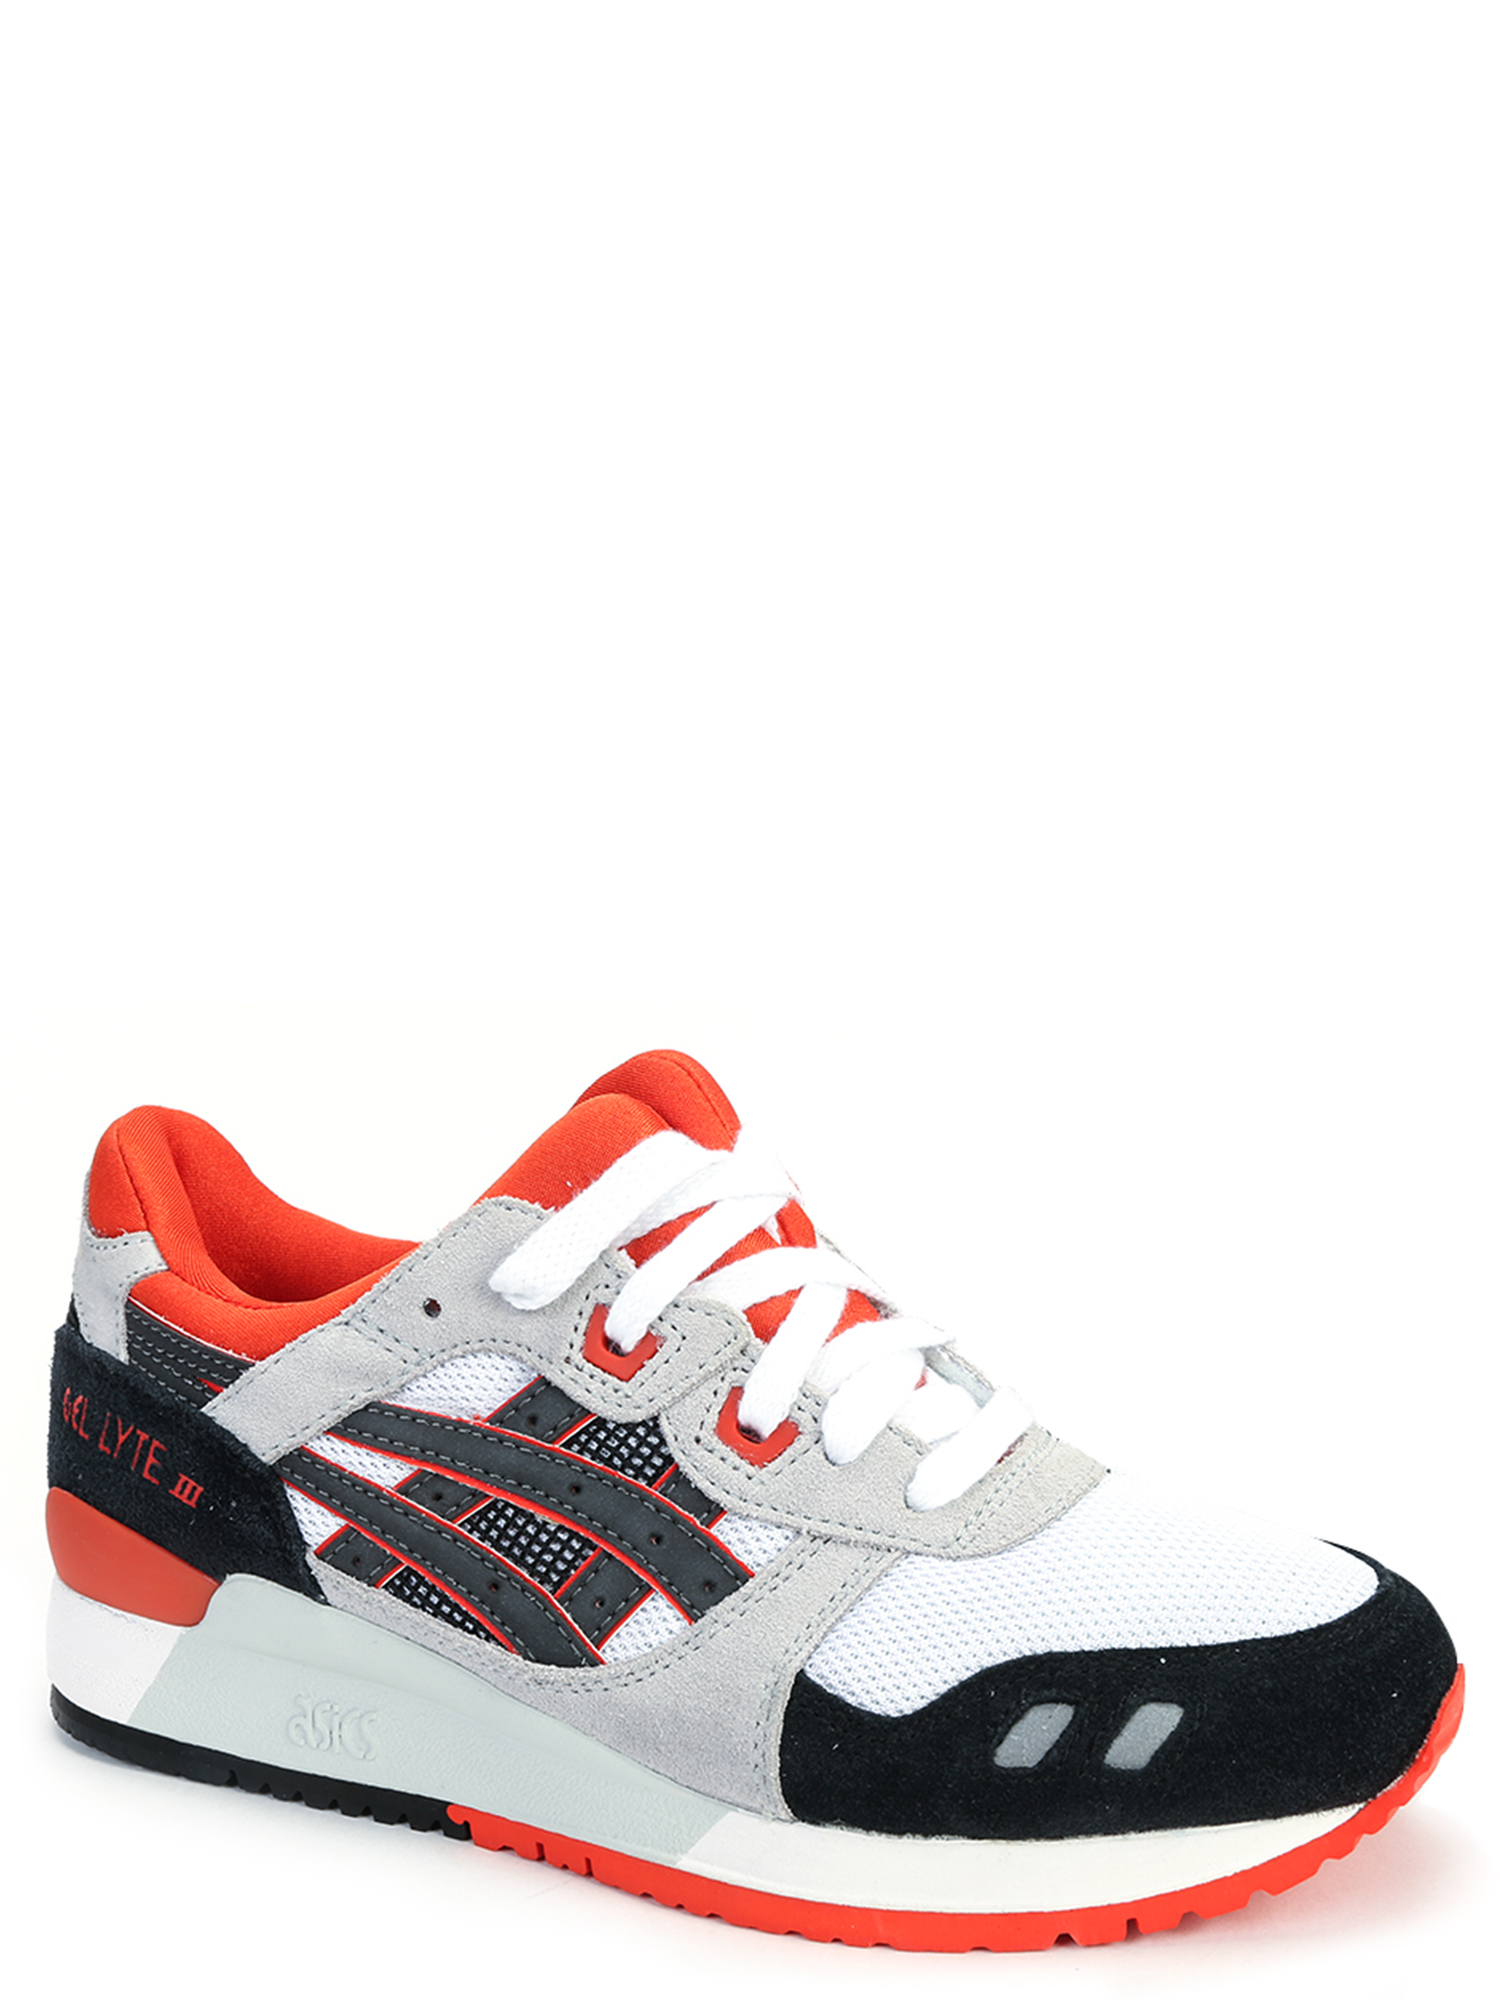 Asics Men's Gel-Lyte III Sneakers H518N-0190 White Black Infrared by